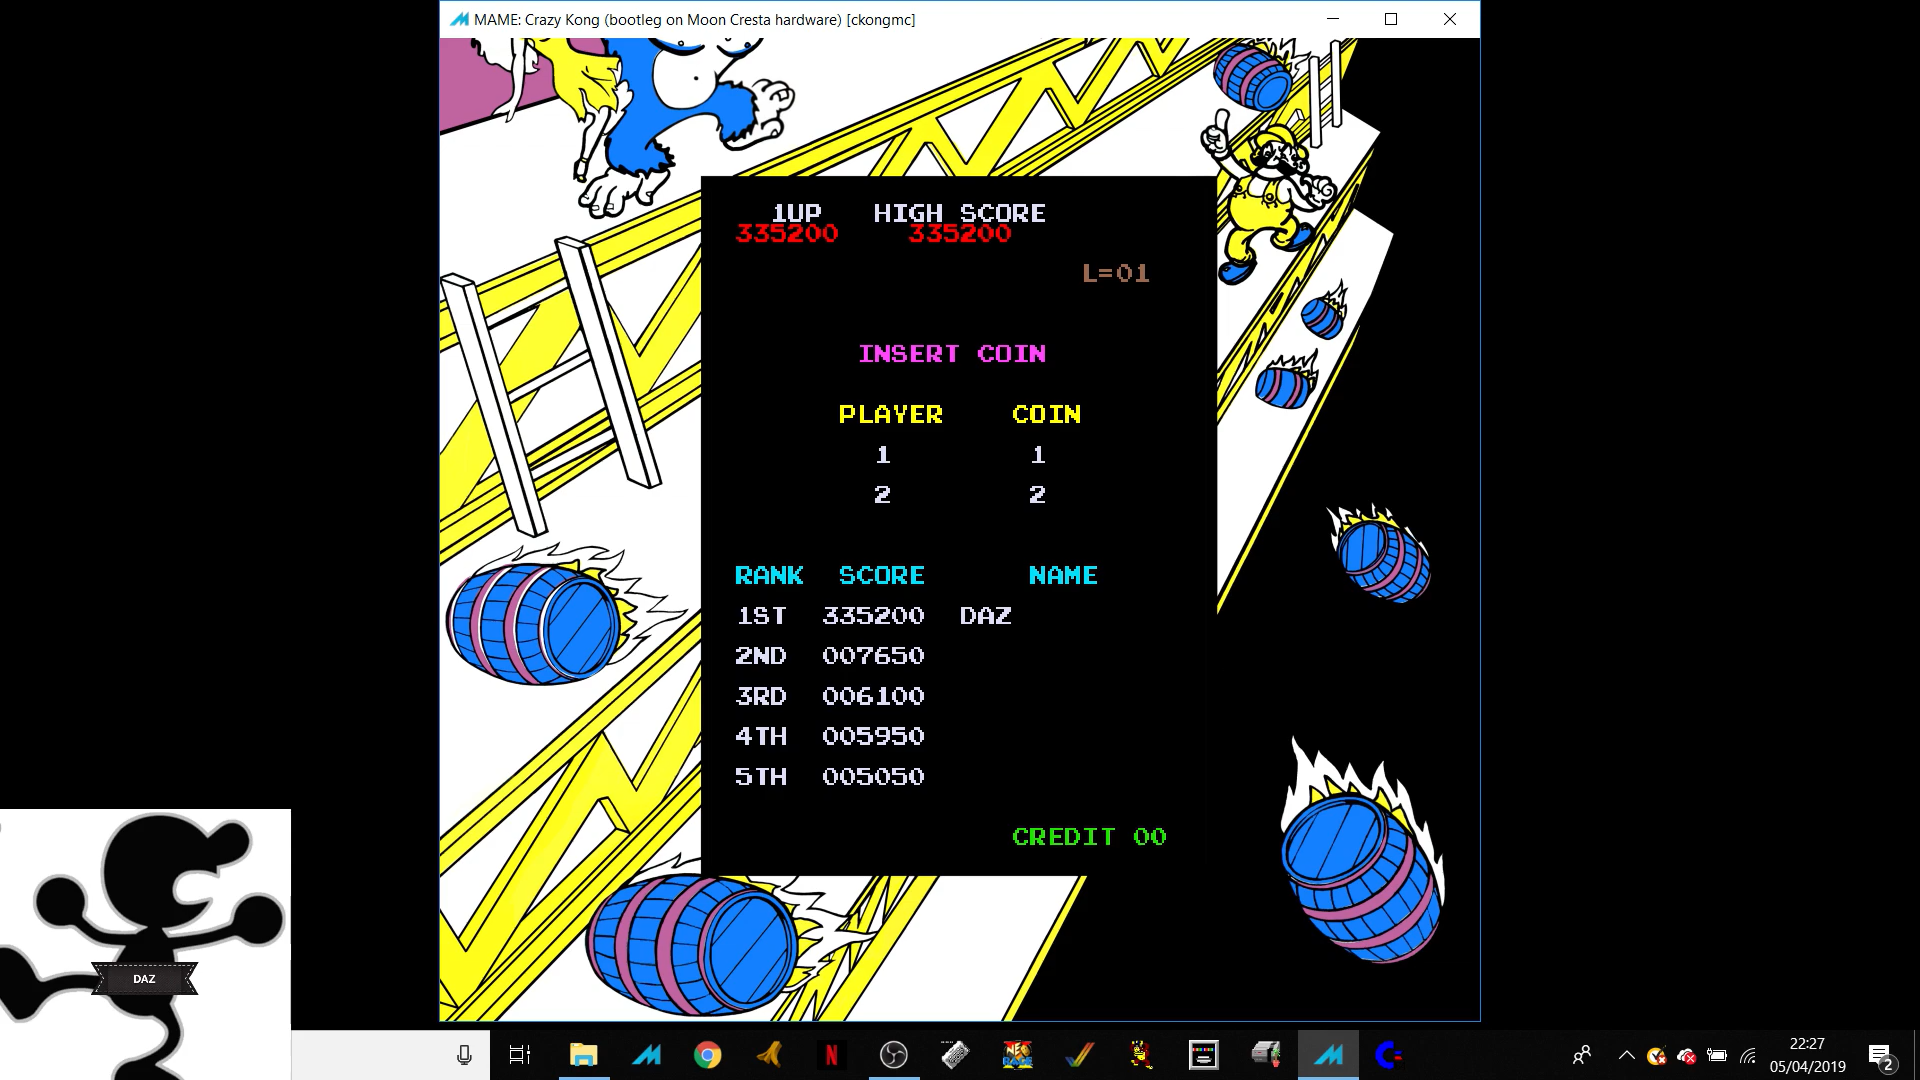 Crazy Kong [Moon Cresta Hardware] [ckongmc] 335,200 points